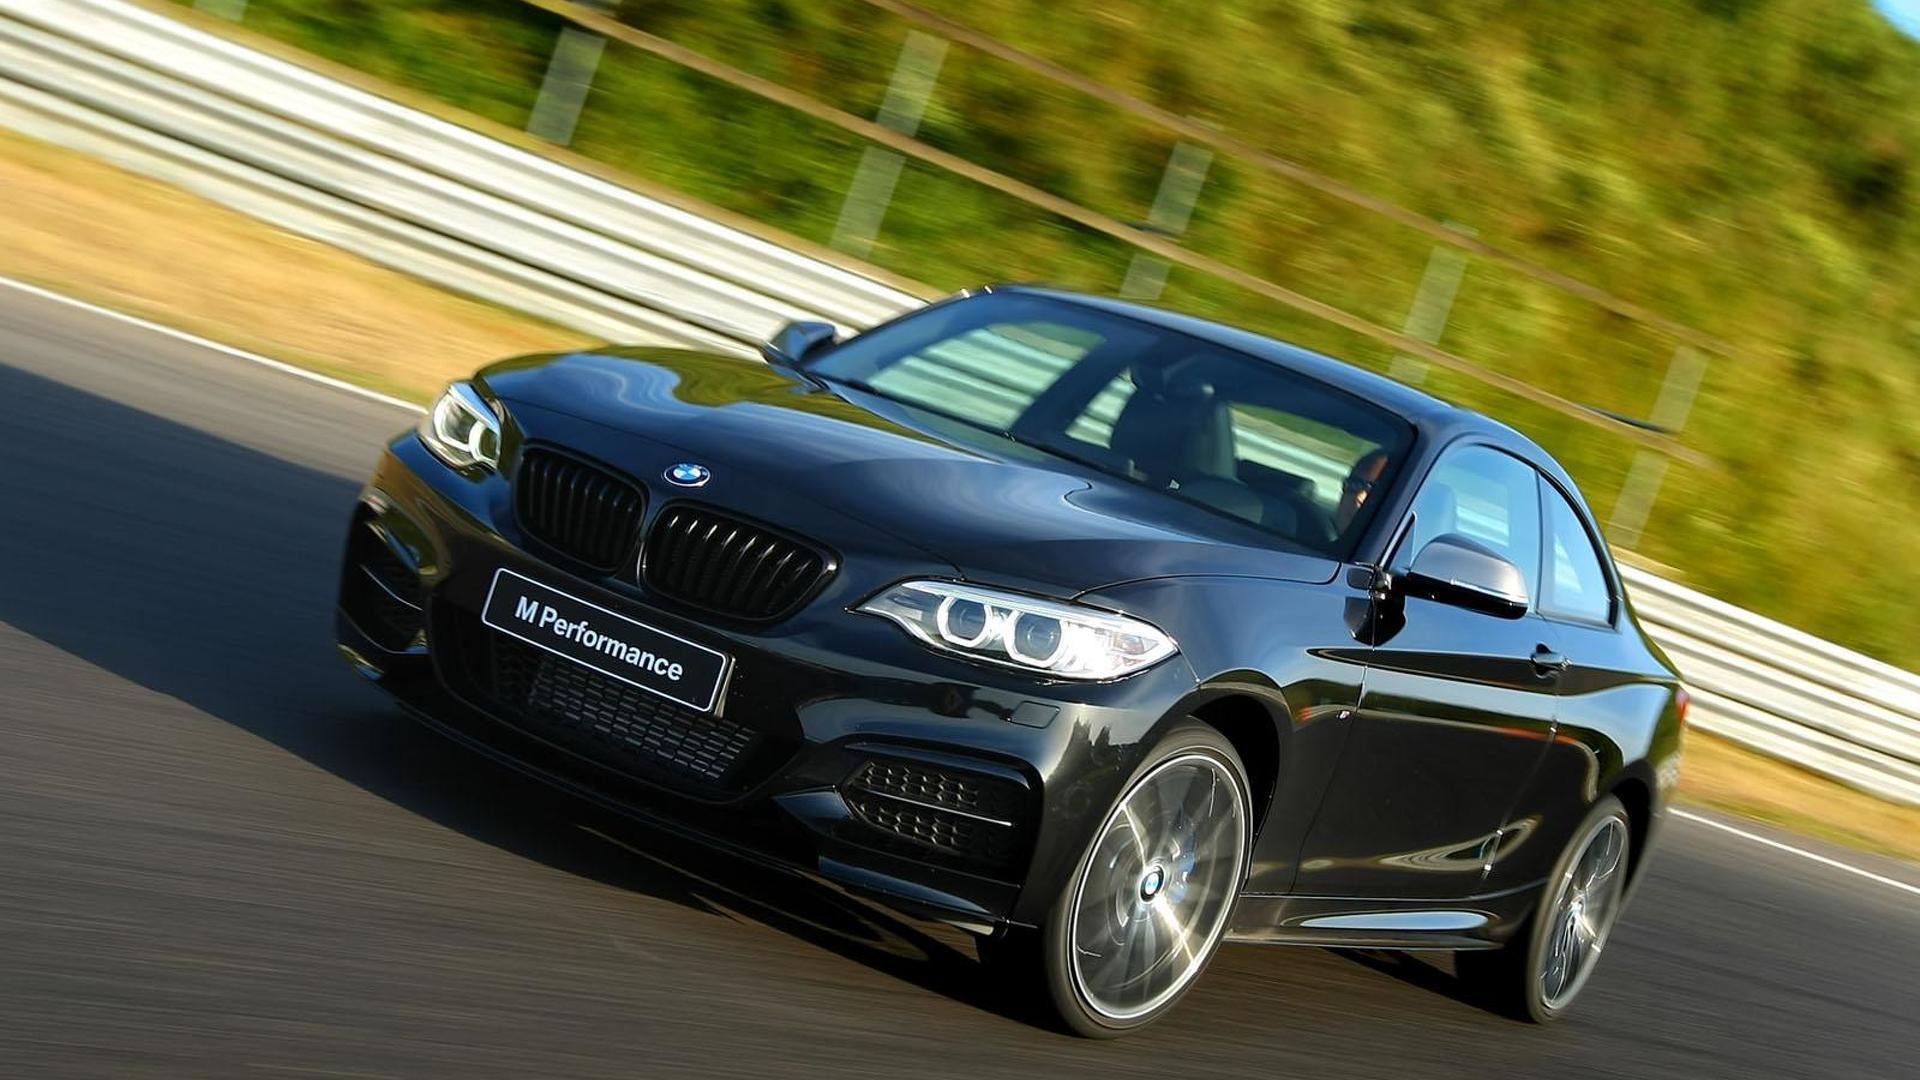 BMW M235i Track Edition unveiled